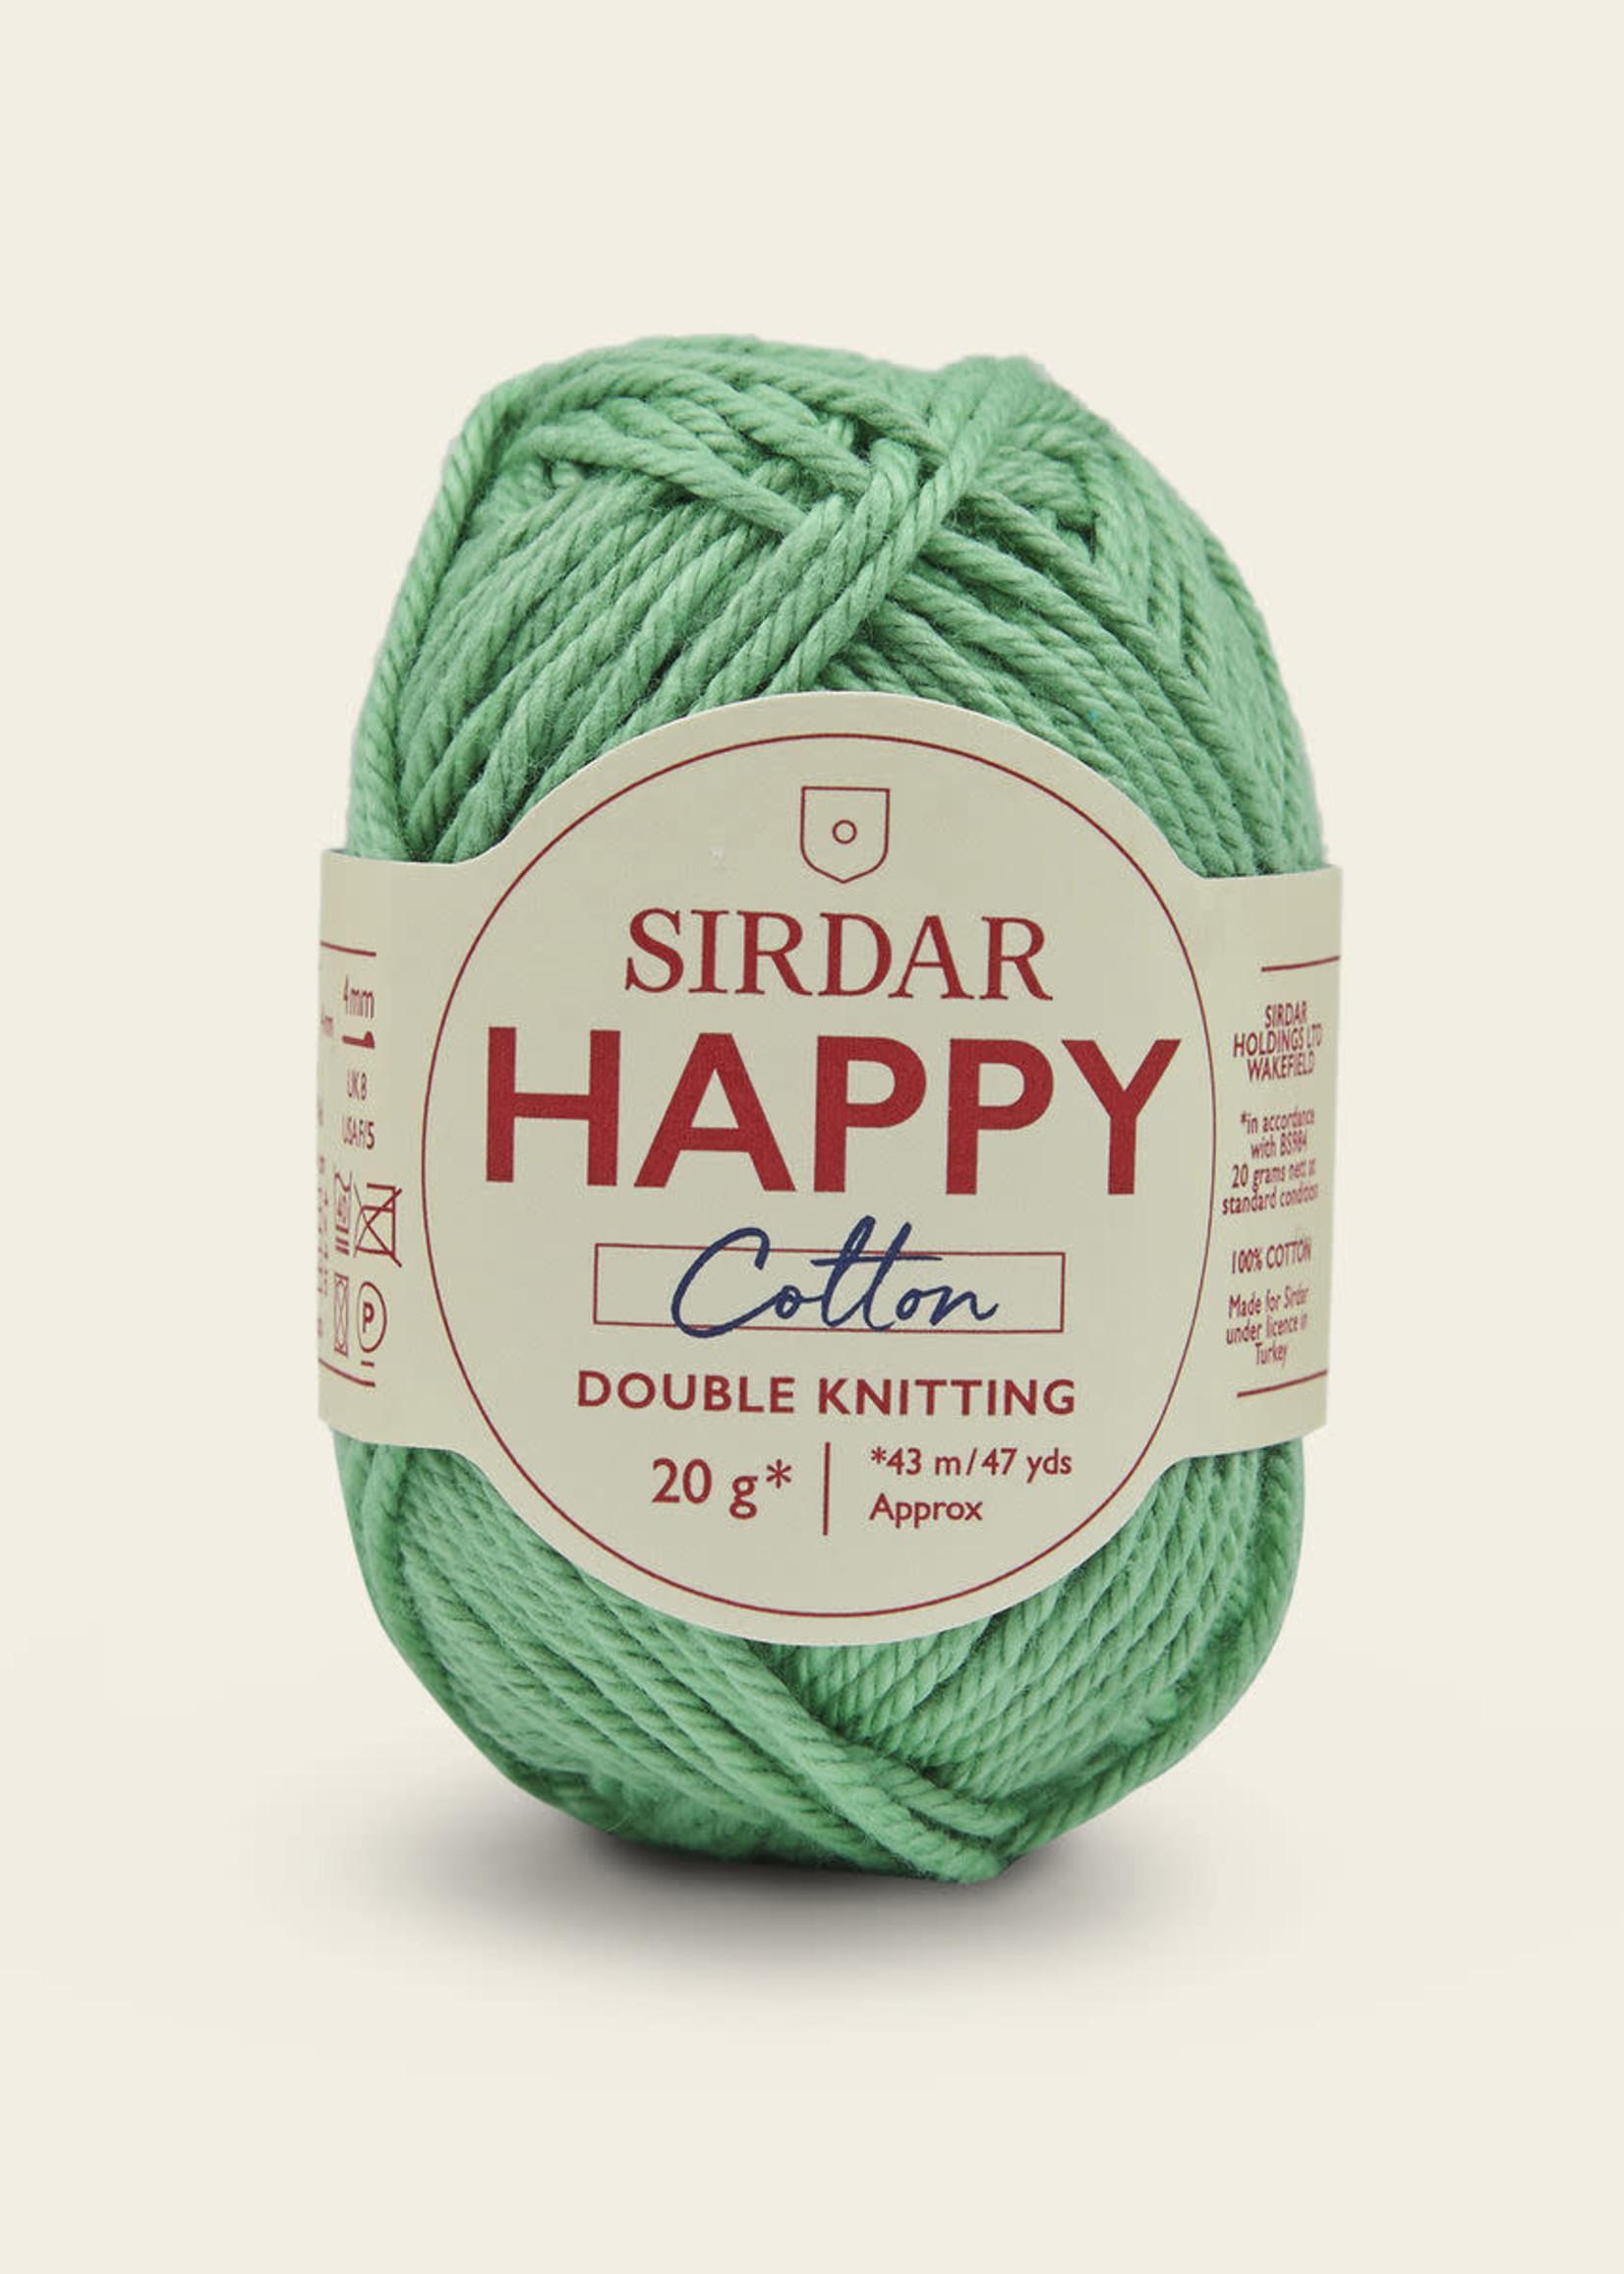 Sirdar Sirdar Happy Cotton #782 Laundry